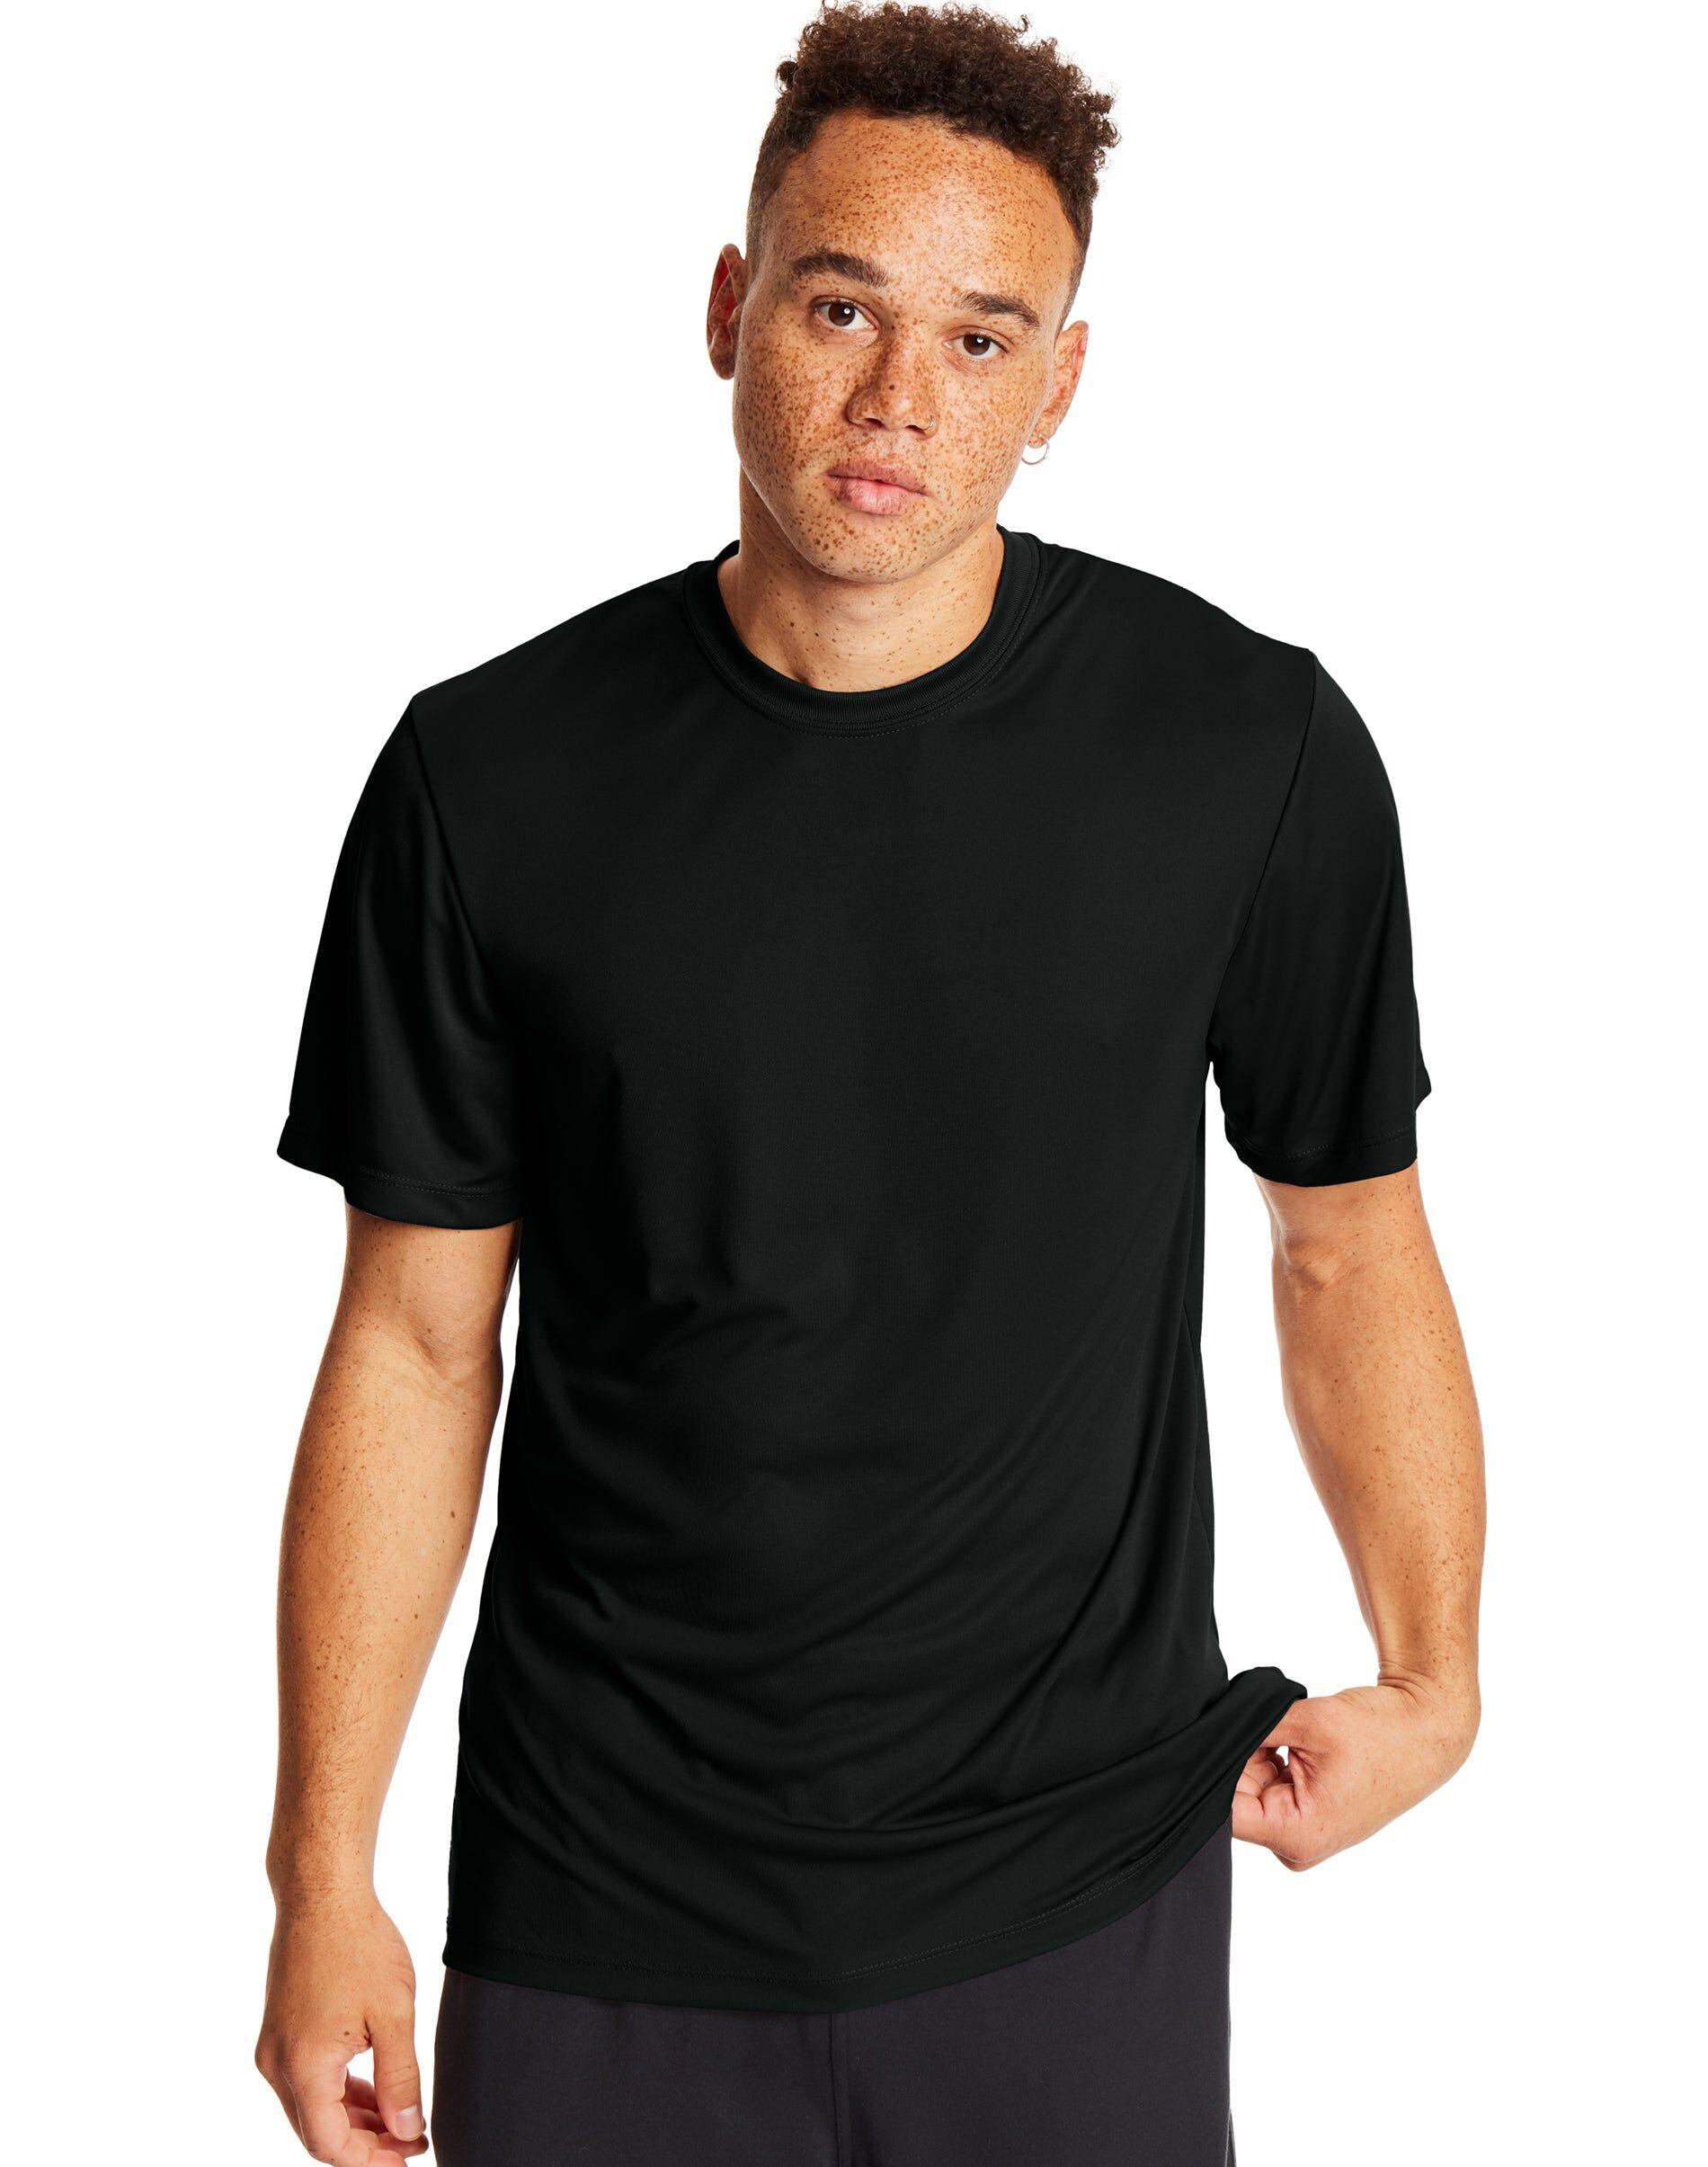 Hanes Sport Cool DRI Men's Performance Tee 2-Pack Black M